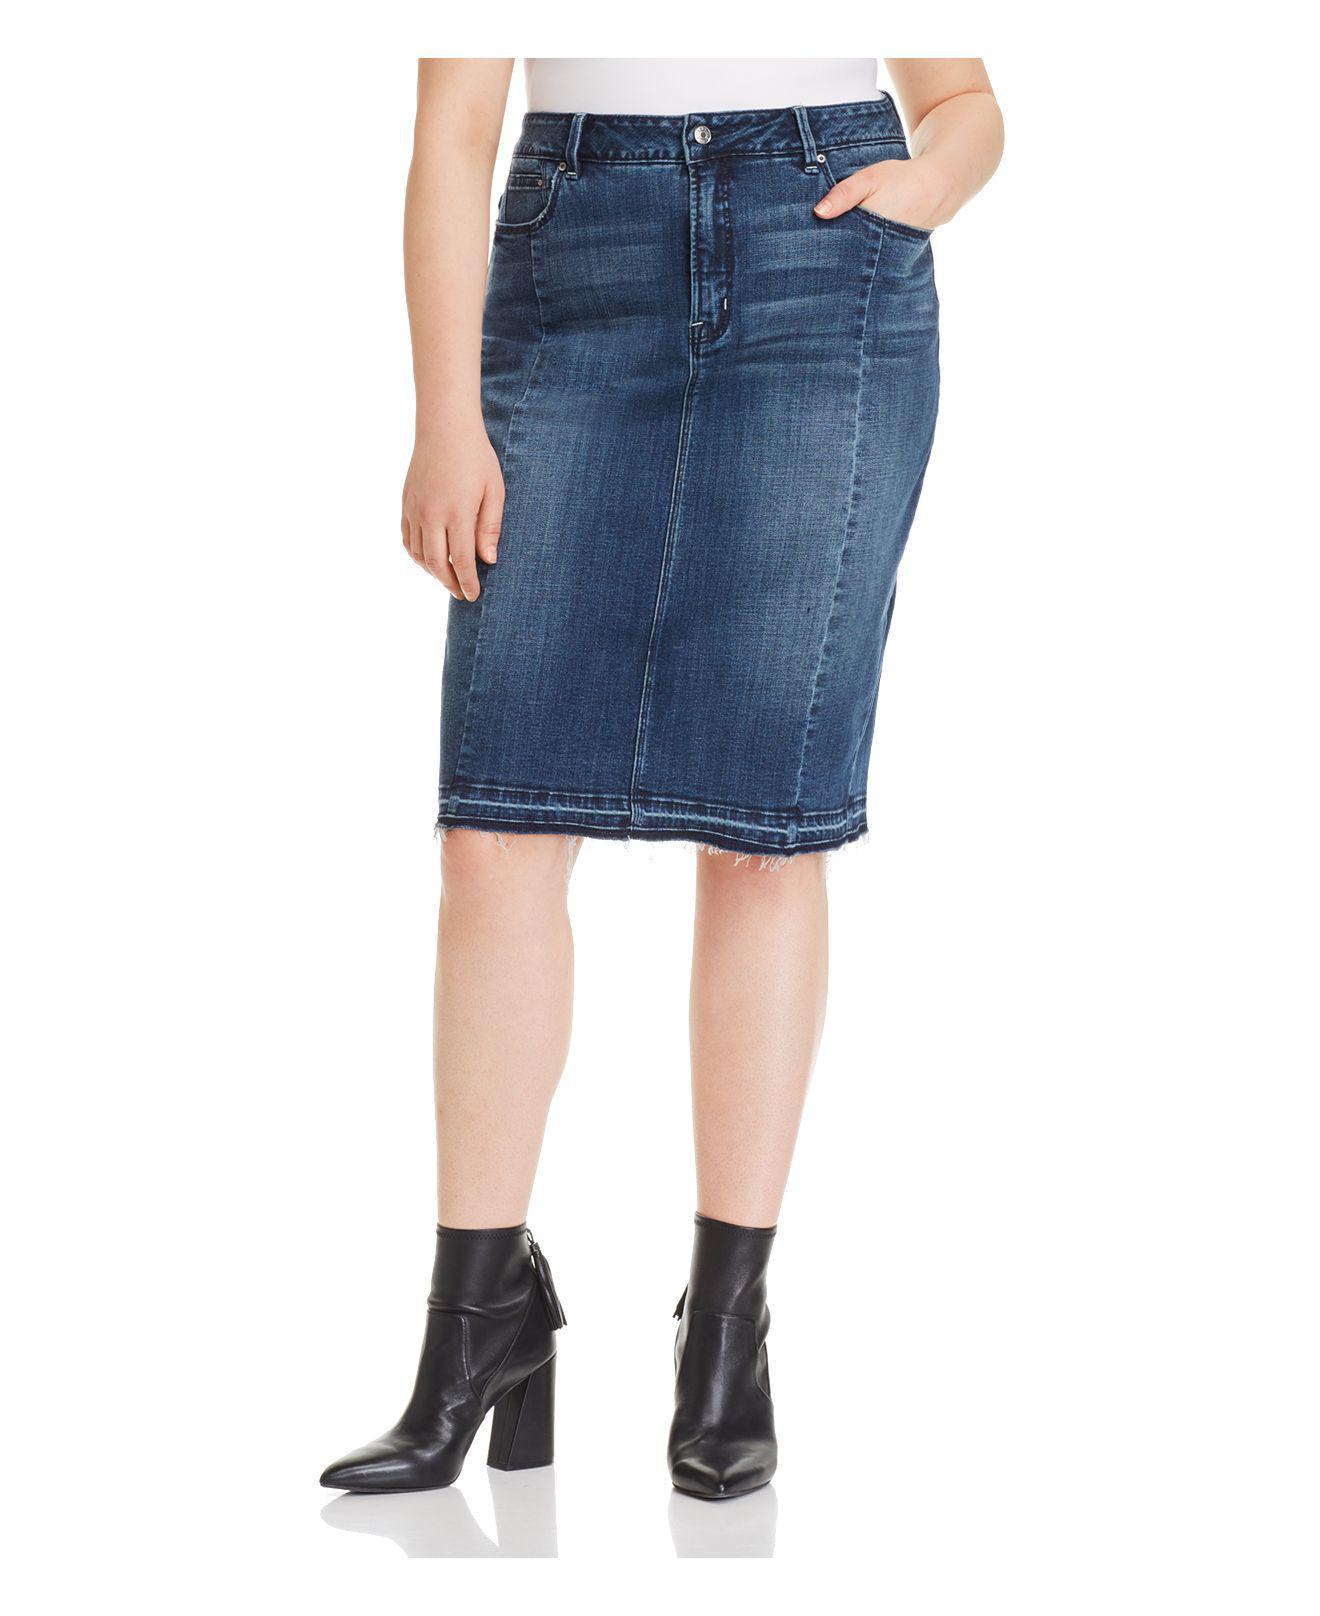 e4a8ff668f Lyst - REBEL WILSON X ANGELS Denim Pencil Skirt in Blue